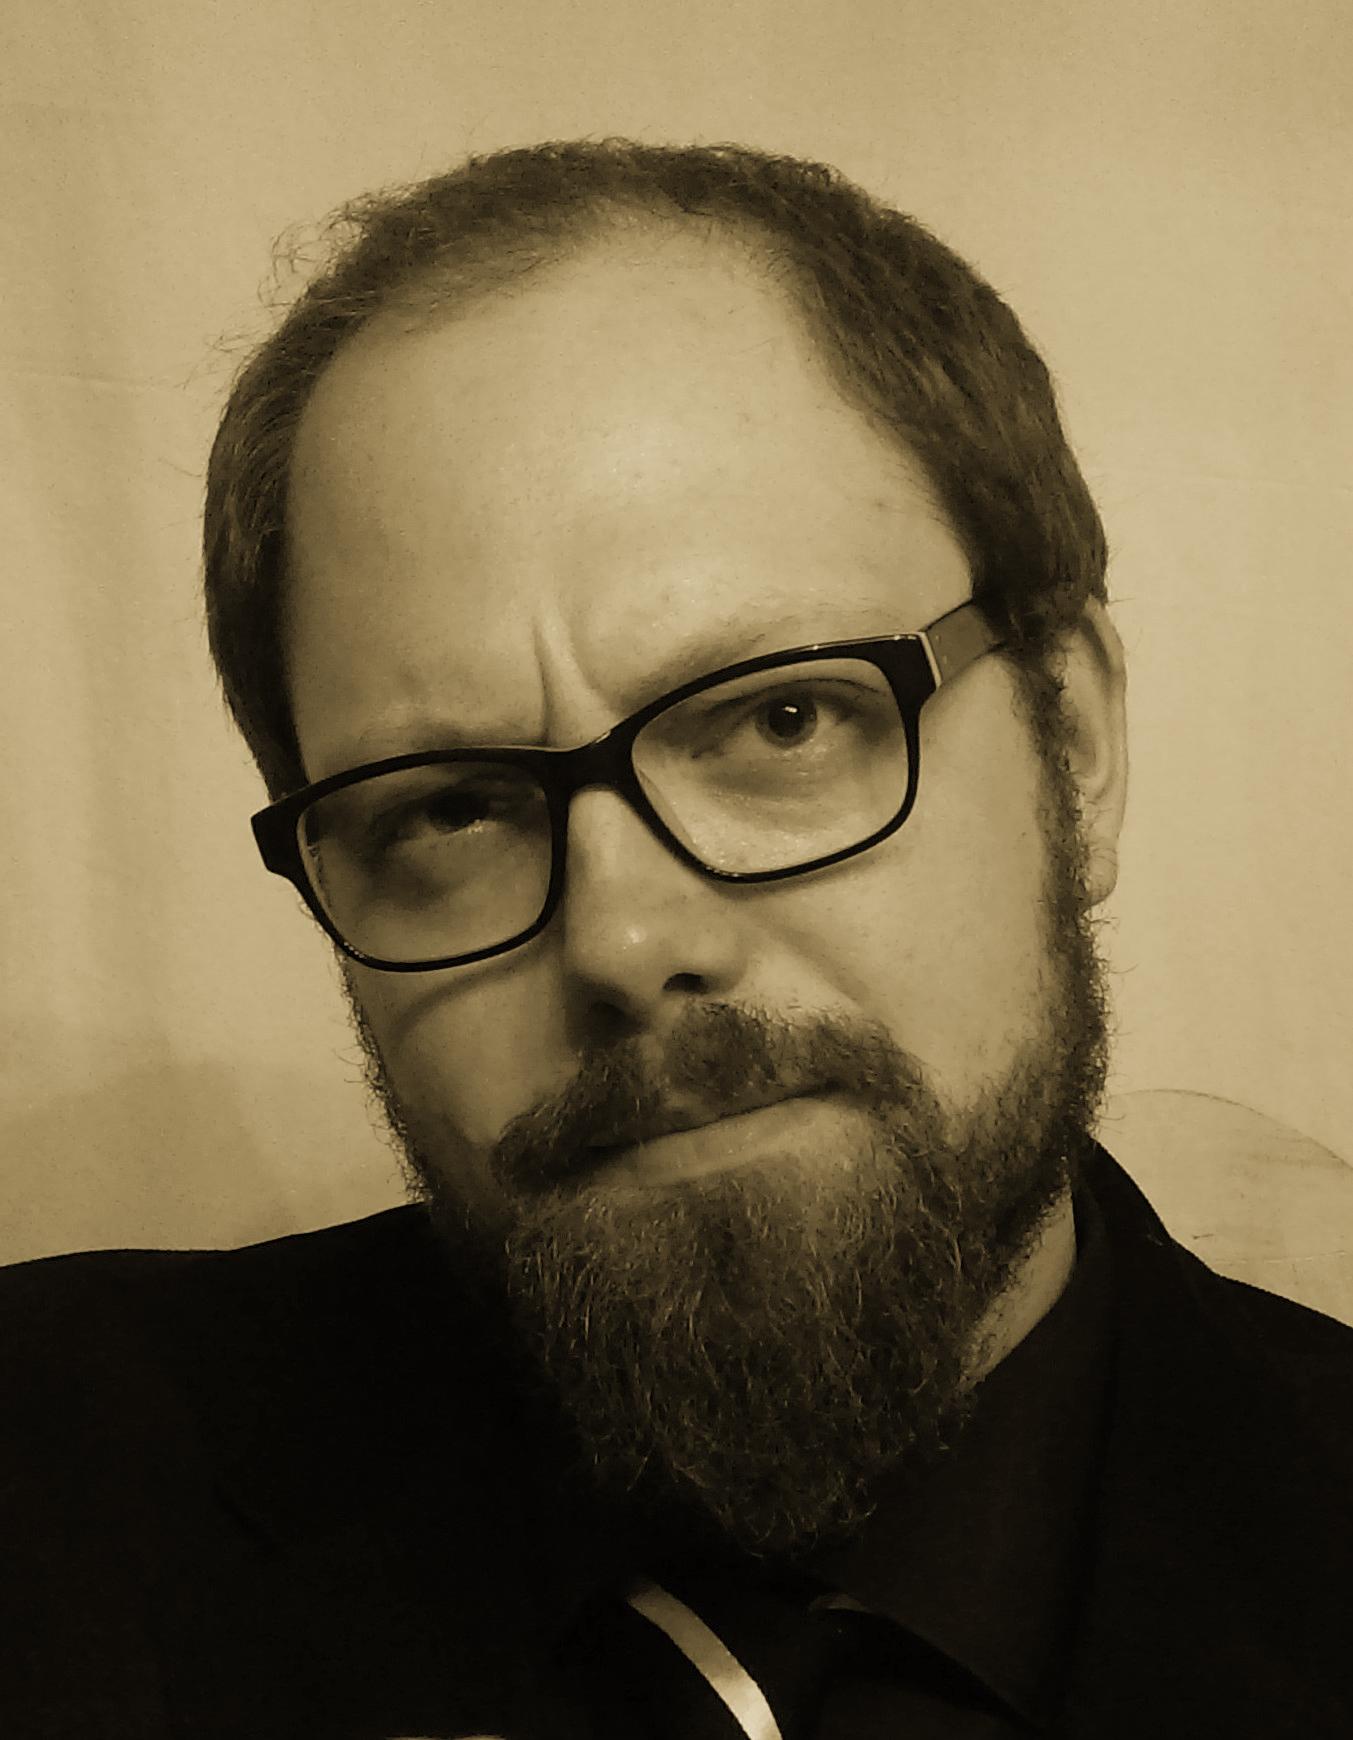 Daniel Pfeiffer